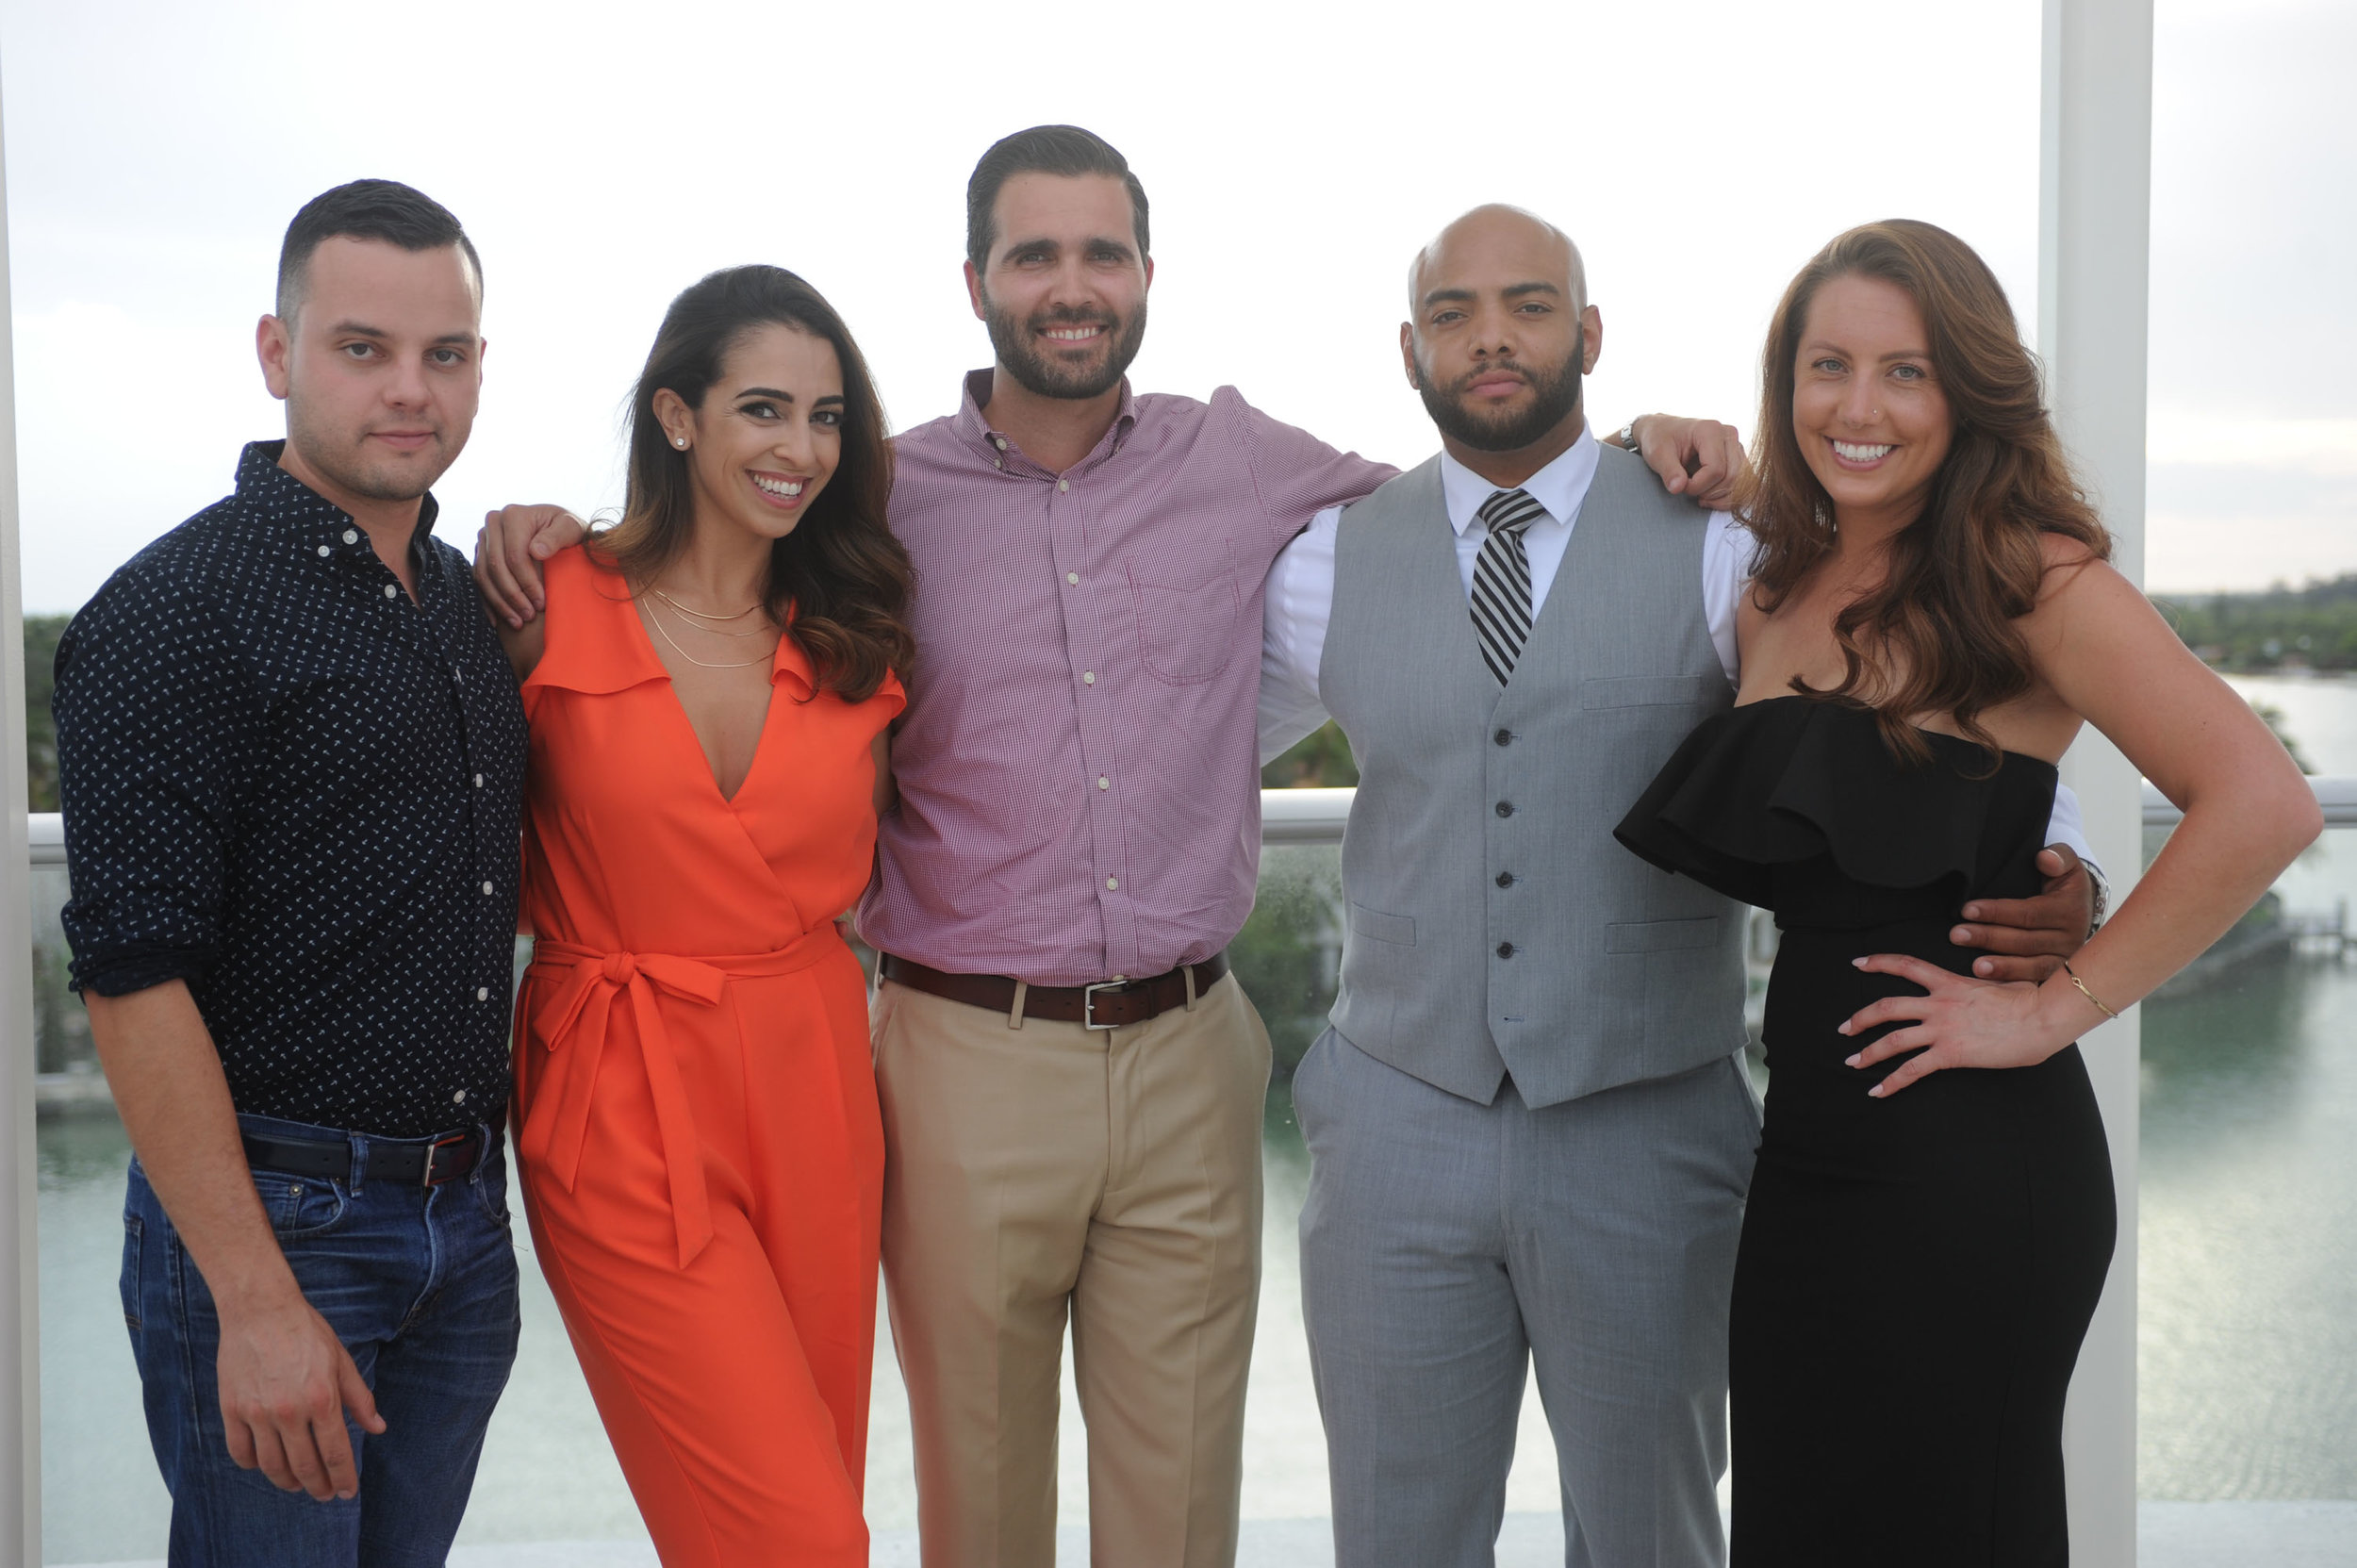 Daniel Zavala, Michelle Setty, Lazaro Diaz, Delto Eli Alcantara, & Stevie Crawfis1.jpg